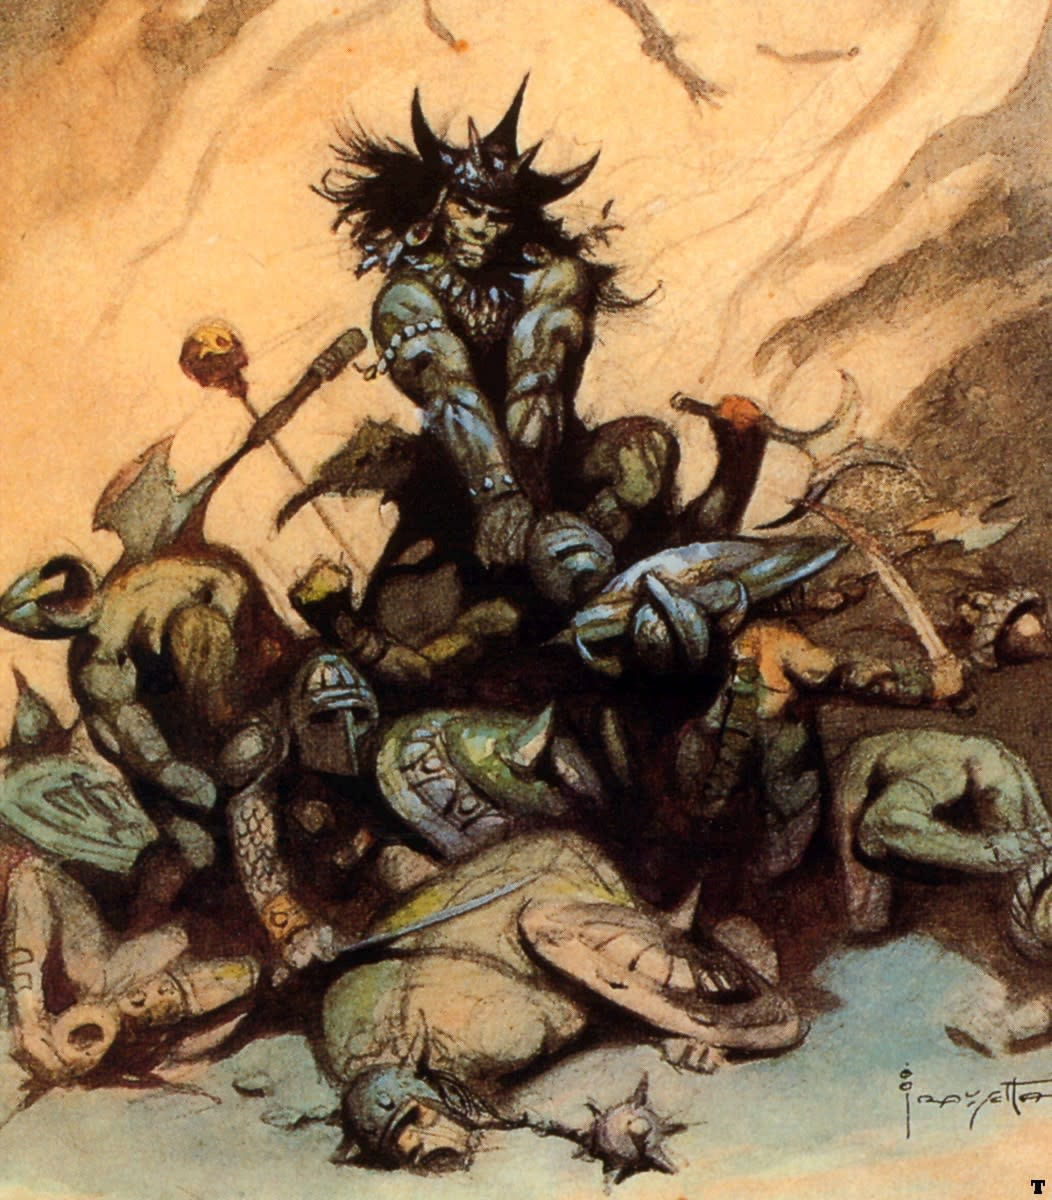 Conan sketch from Frank Frazetta